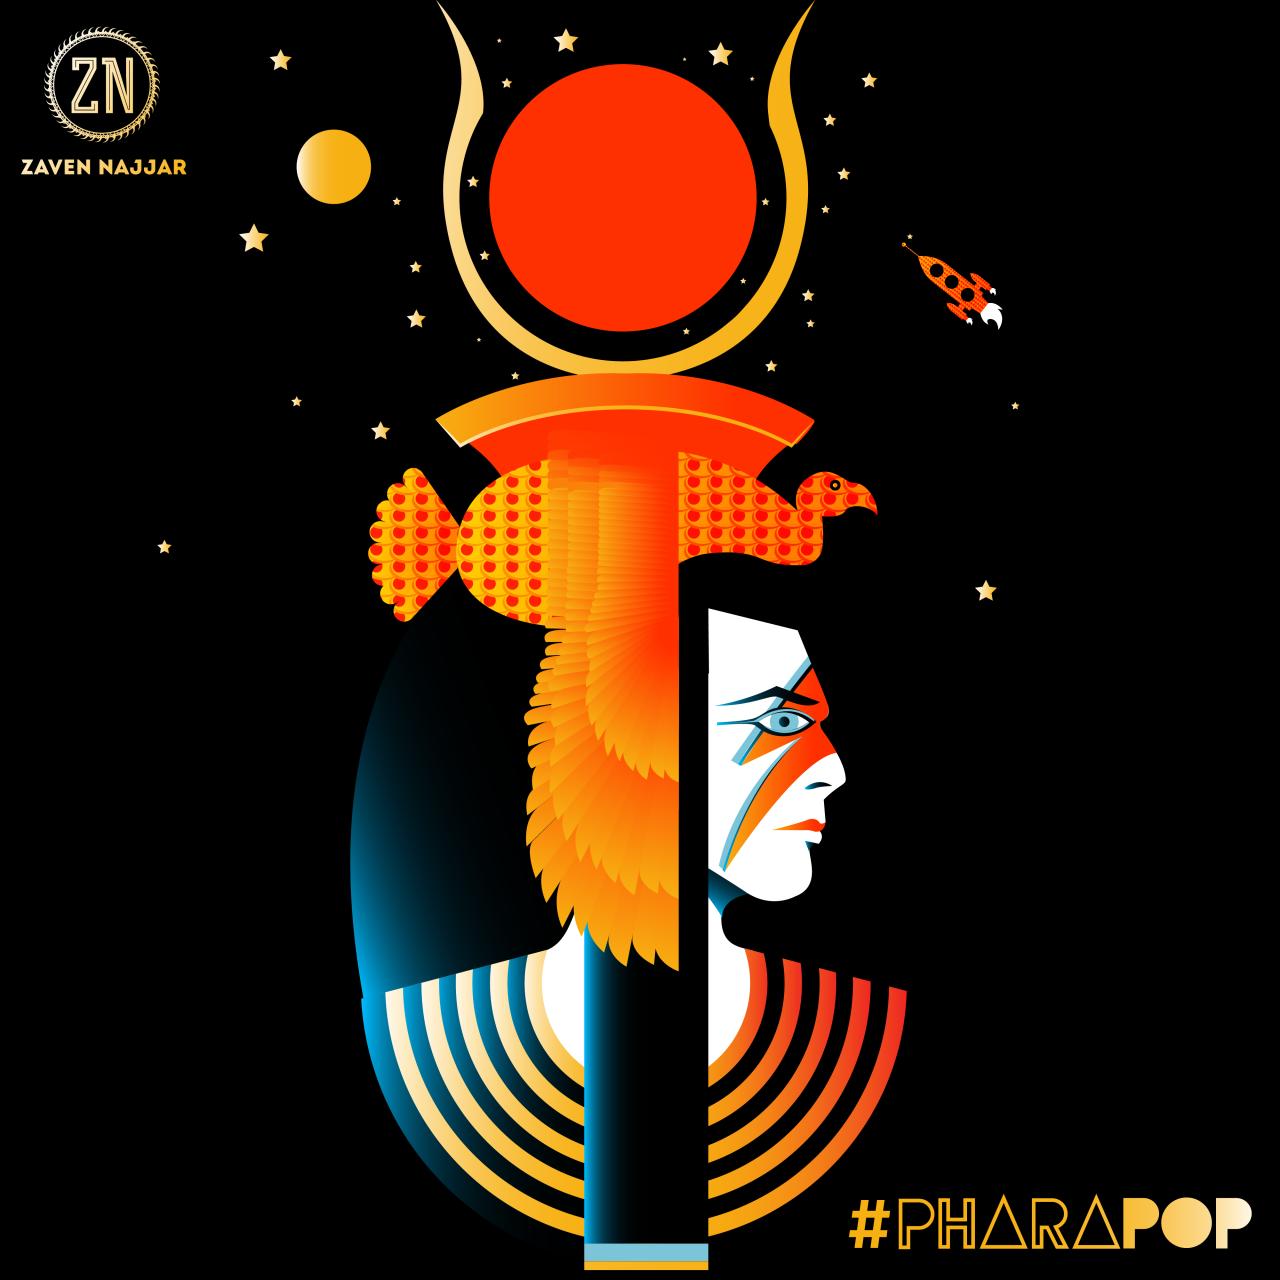 Pharapops David Bowie